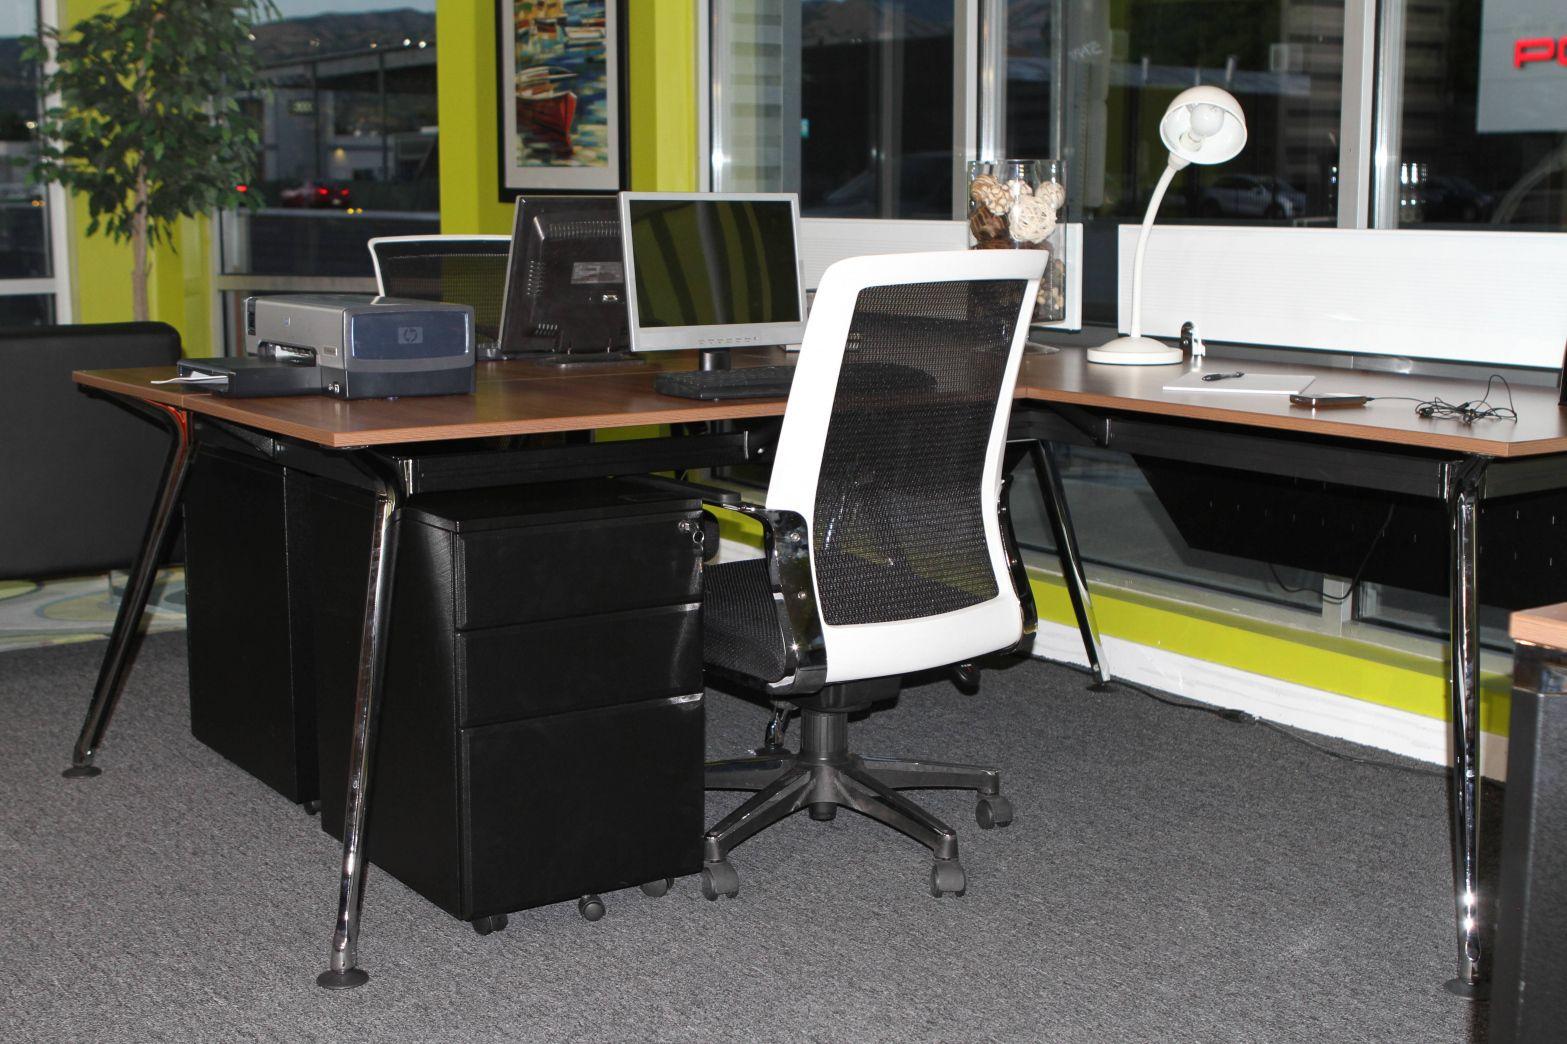 scratch and dent office furniture near me simple art design. Black Bedroom Furniture Sets. Home Design Ideas